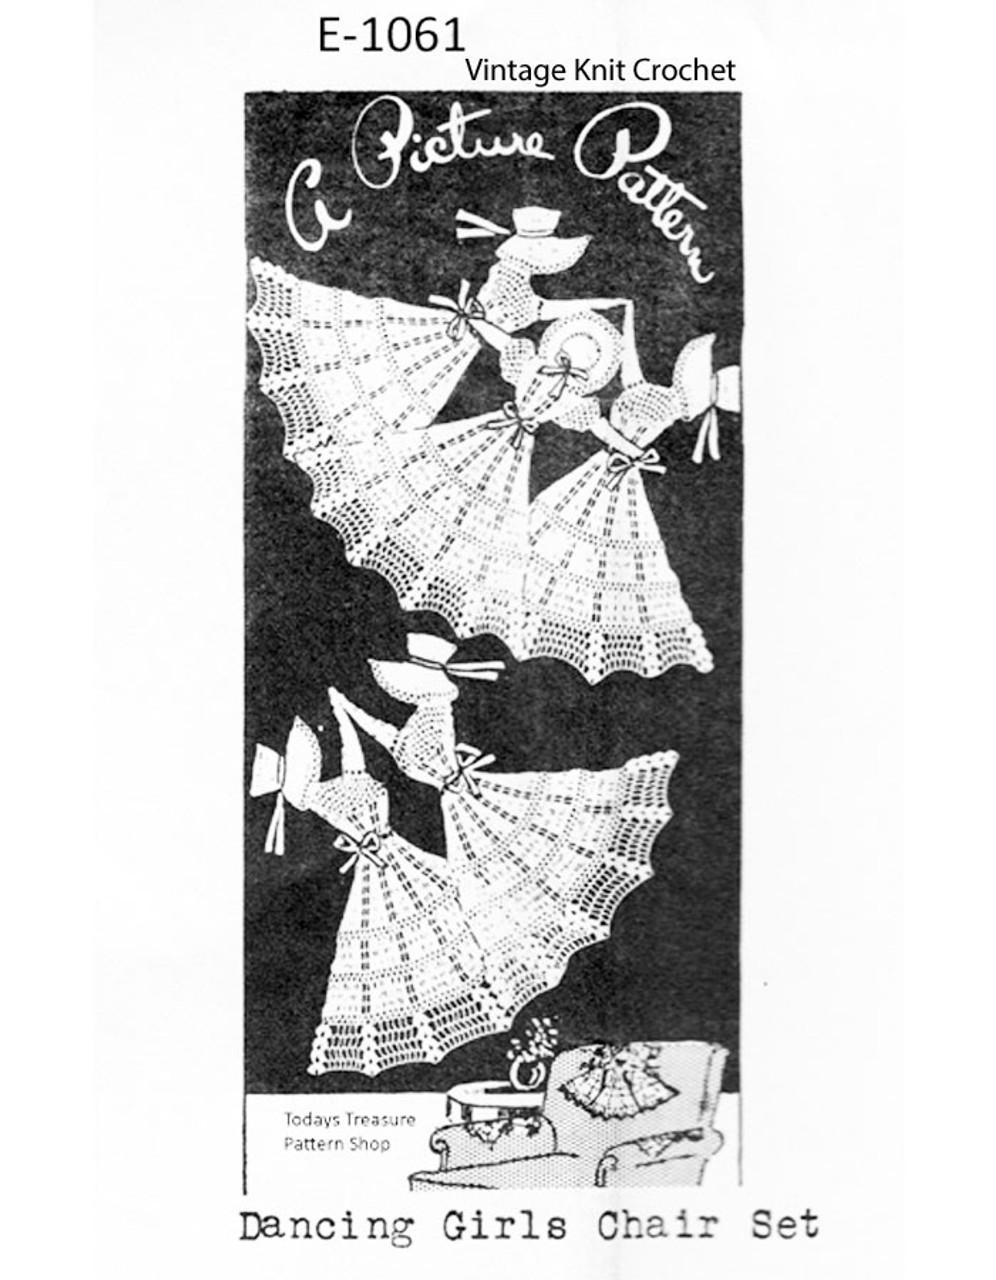 Vintage Crochet Dancing Girls Pattern, Mail Order E-1061